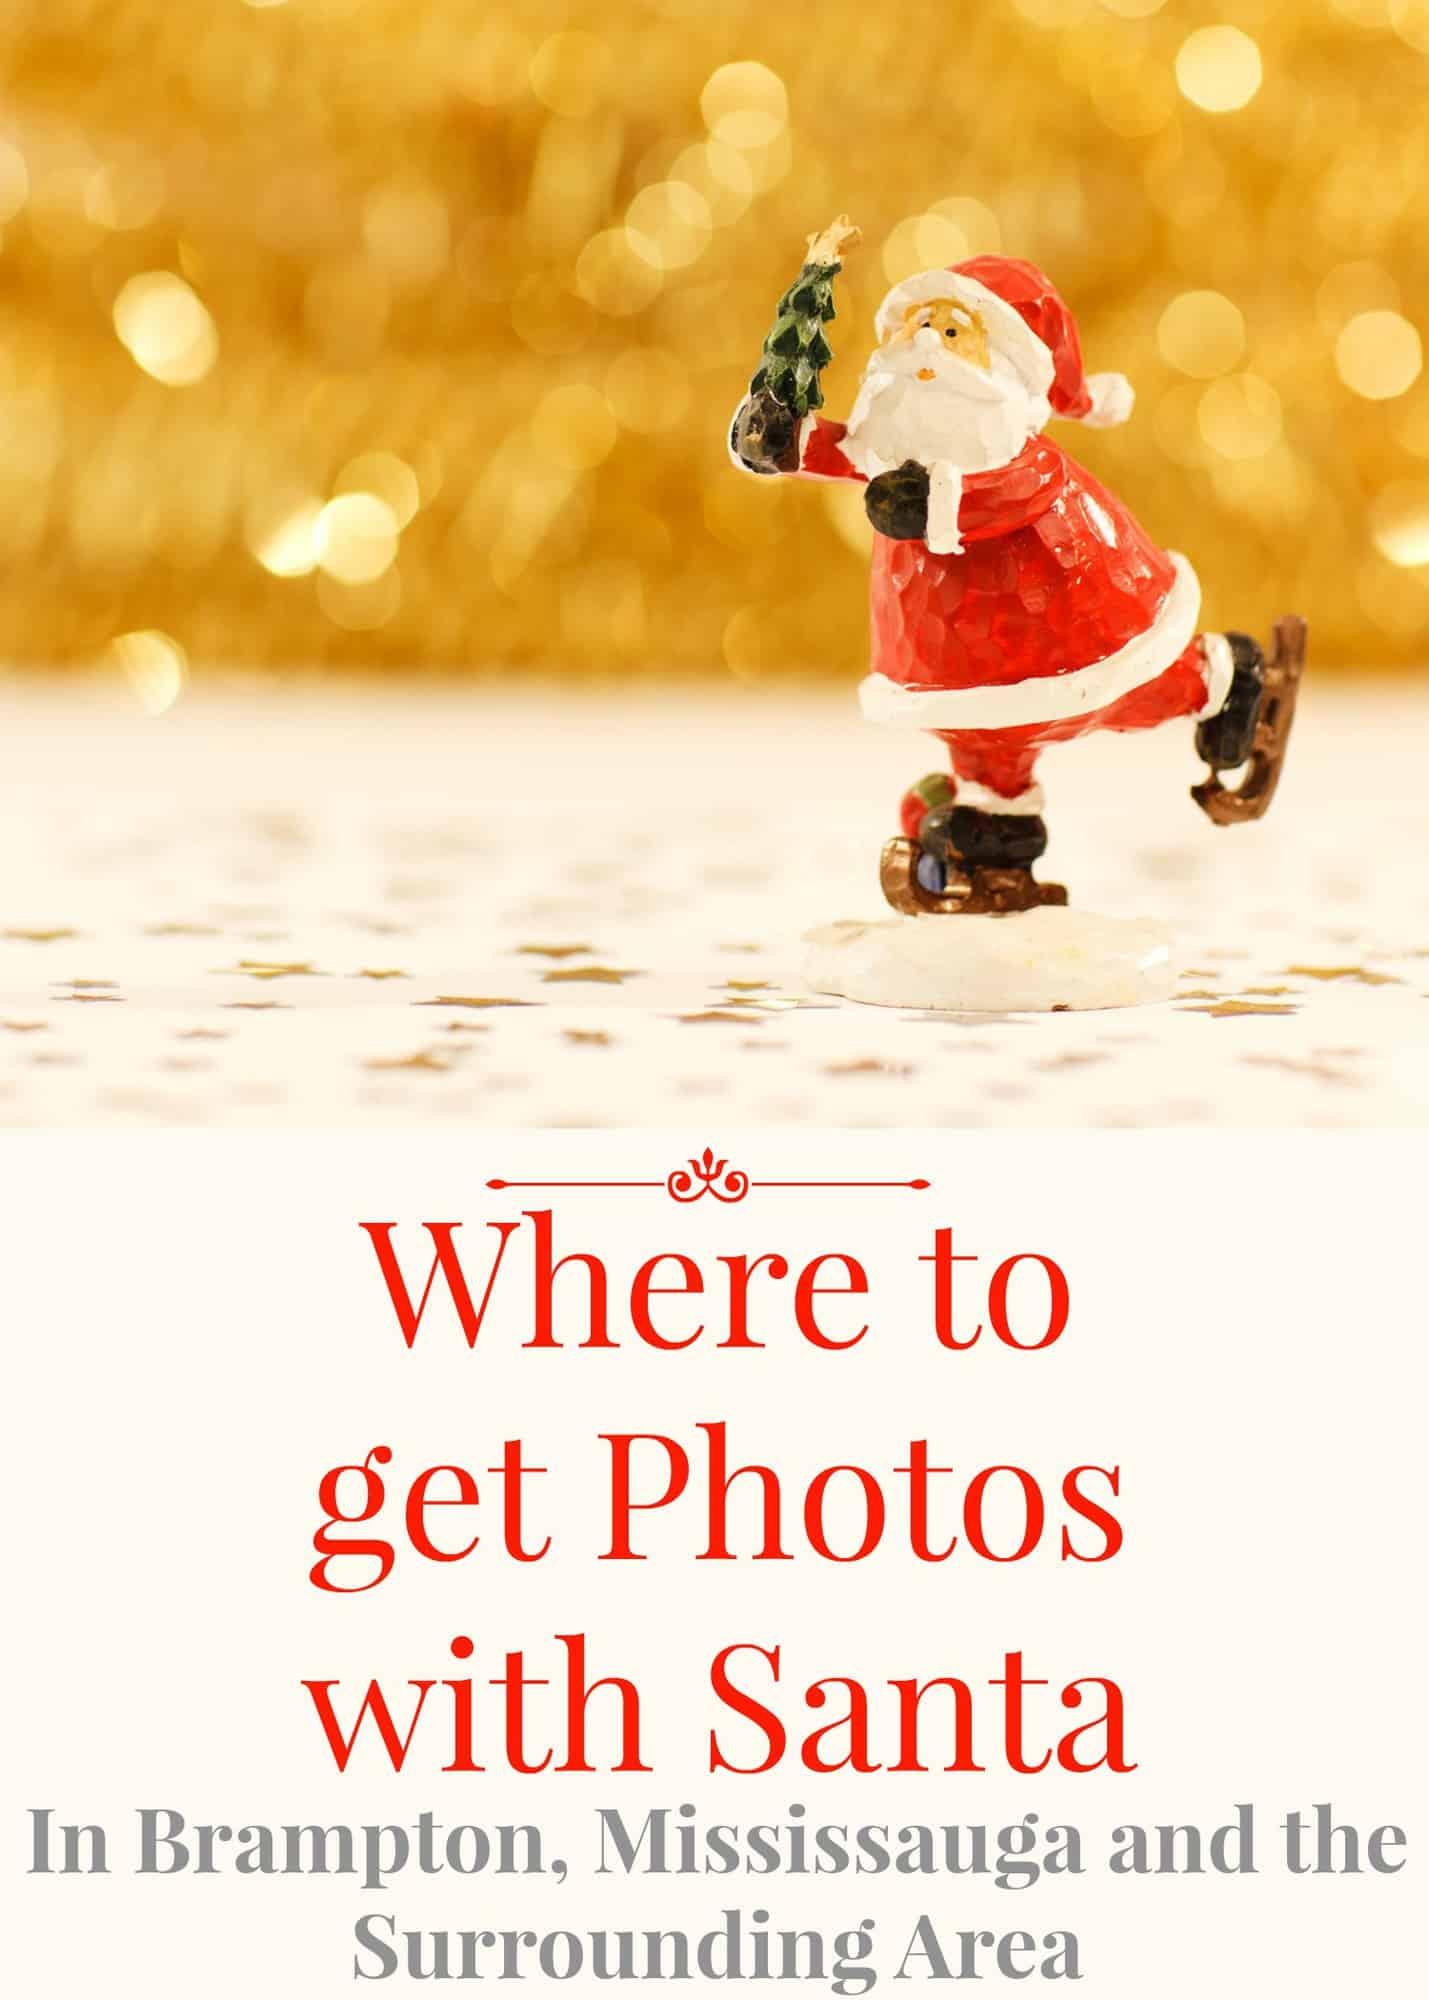 Where to Get Santa Photos in Brampton, Mississauga and Surrounding Area